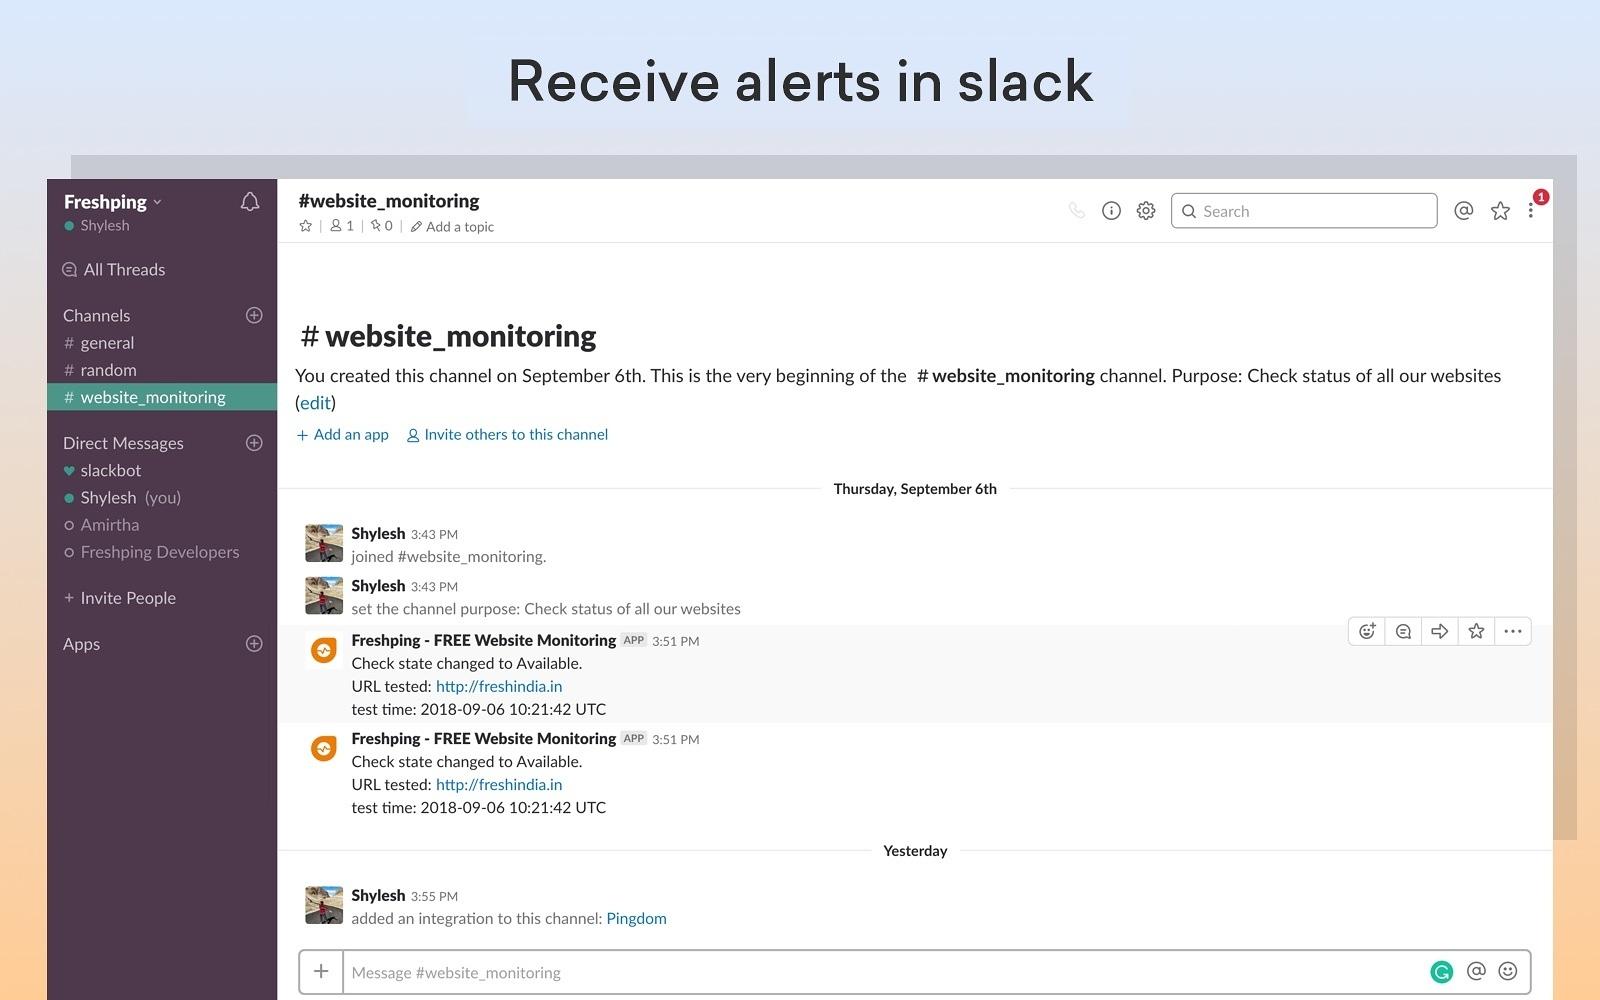 Freshping - FREE Website Monitoring | Slack App Directory